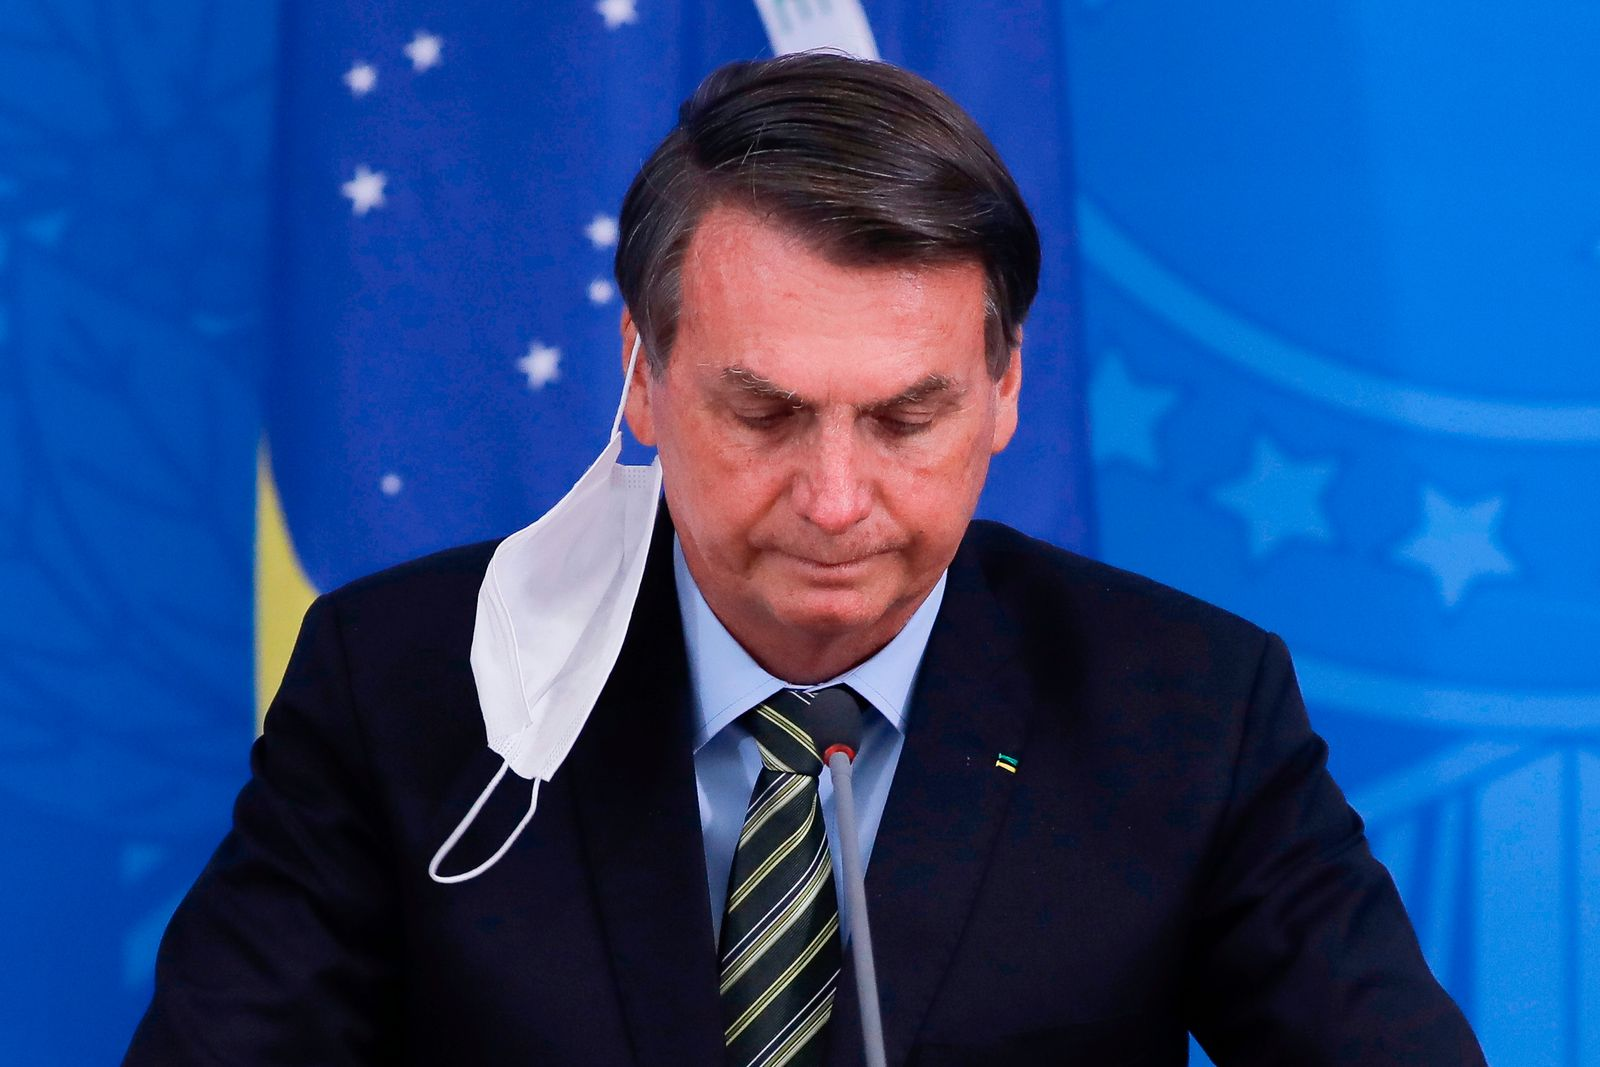 FILES-BRAZIL-HEALTH-VIRUS-BOLSONARO